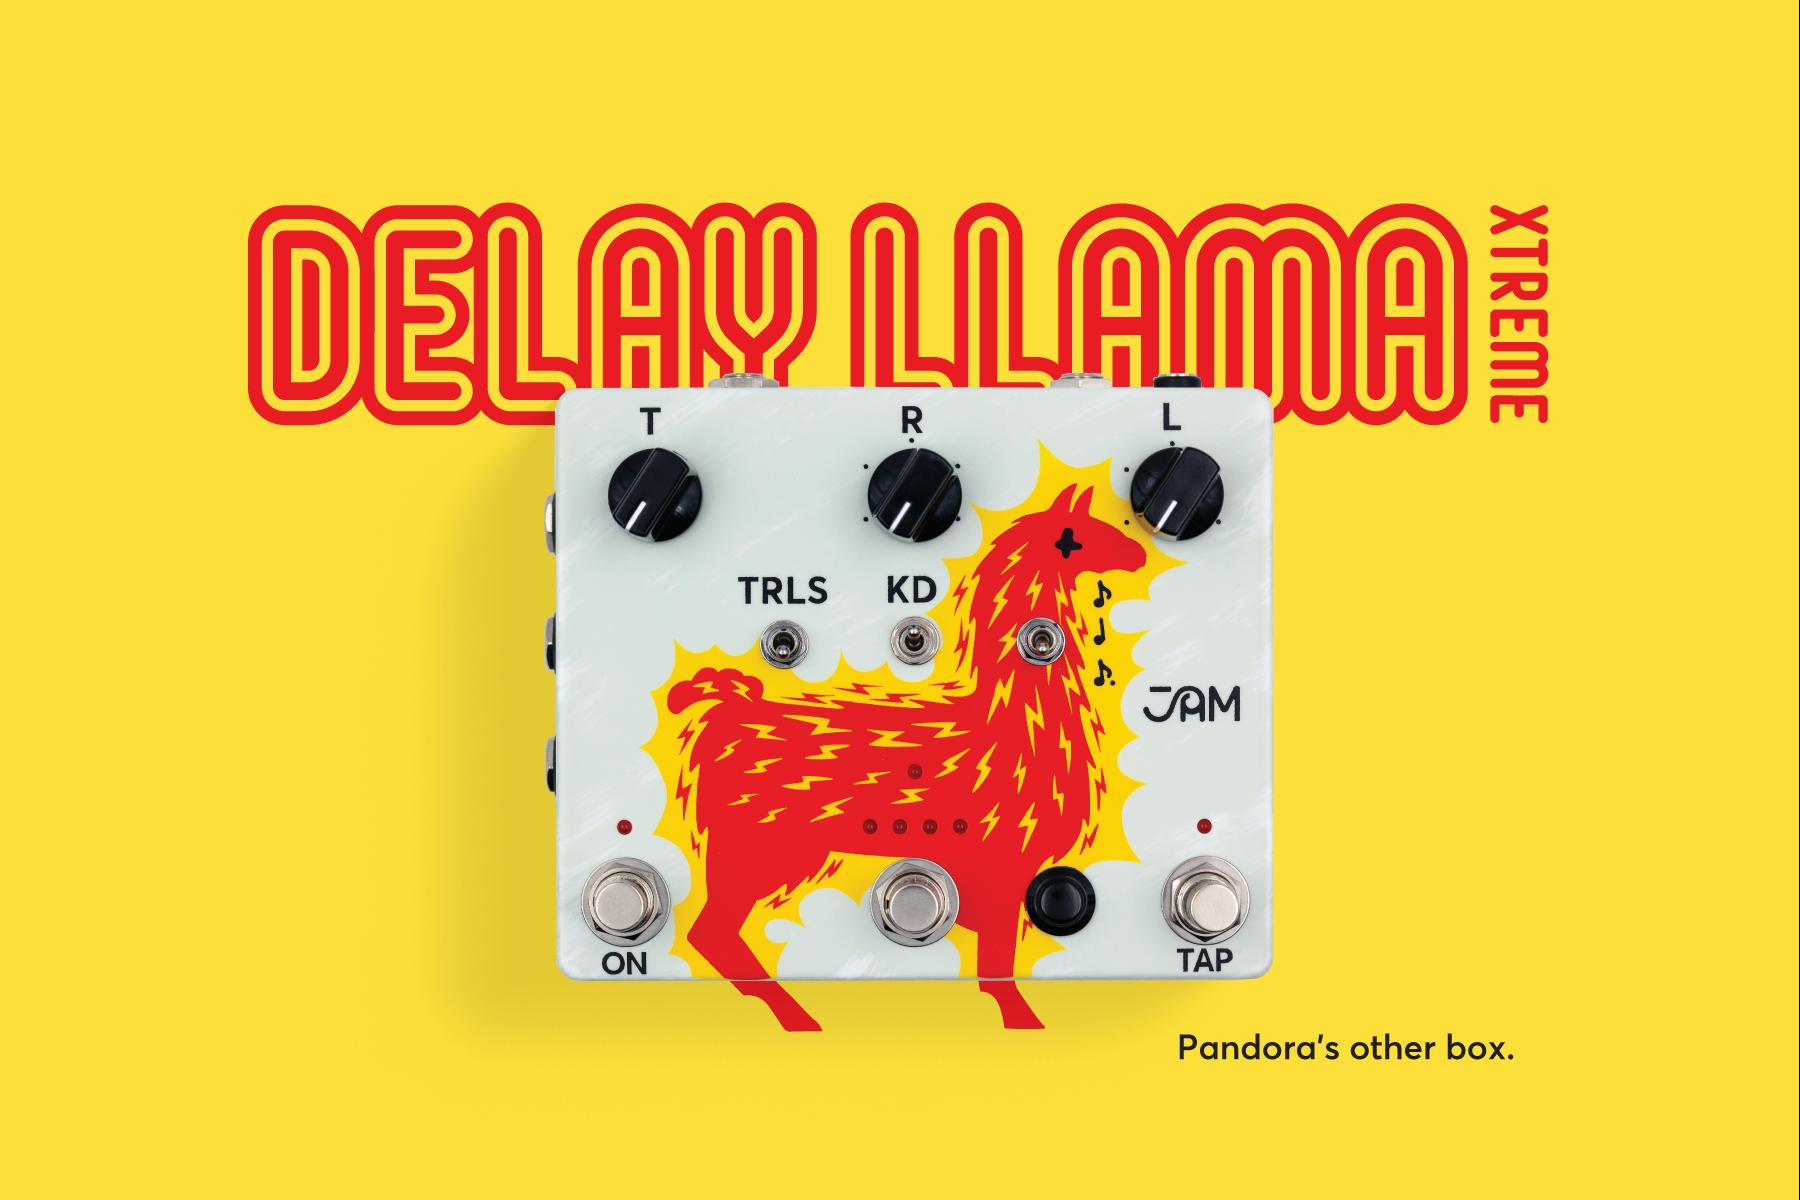 Delay Llama Xtreme